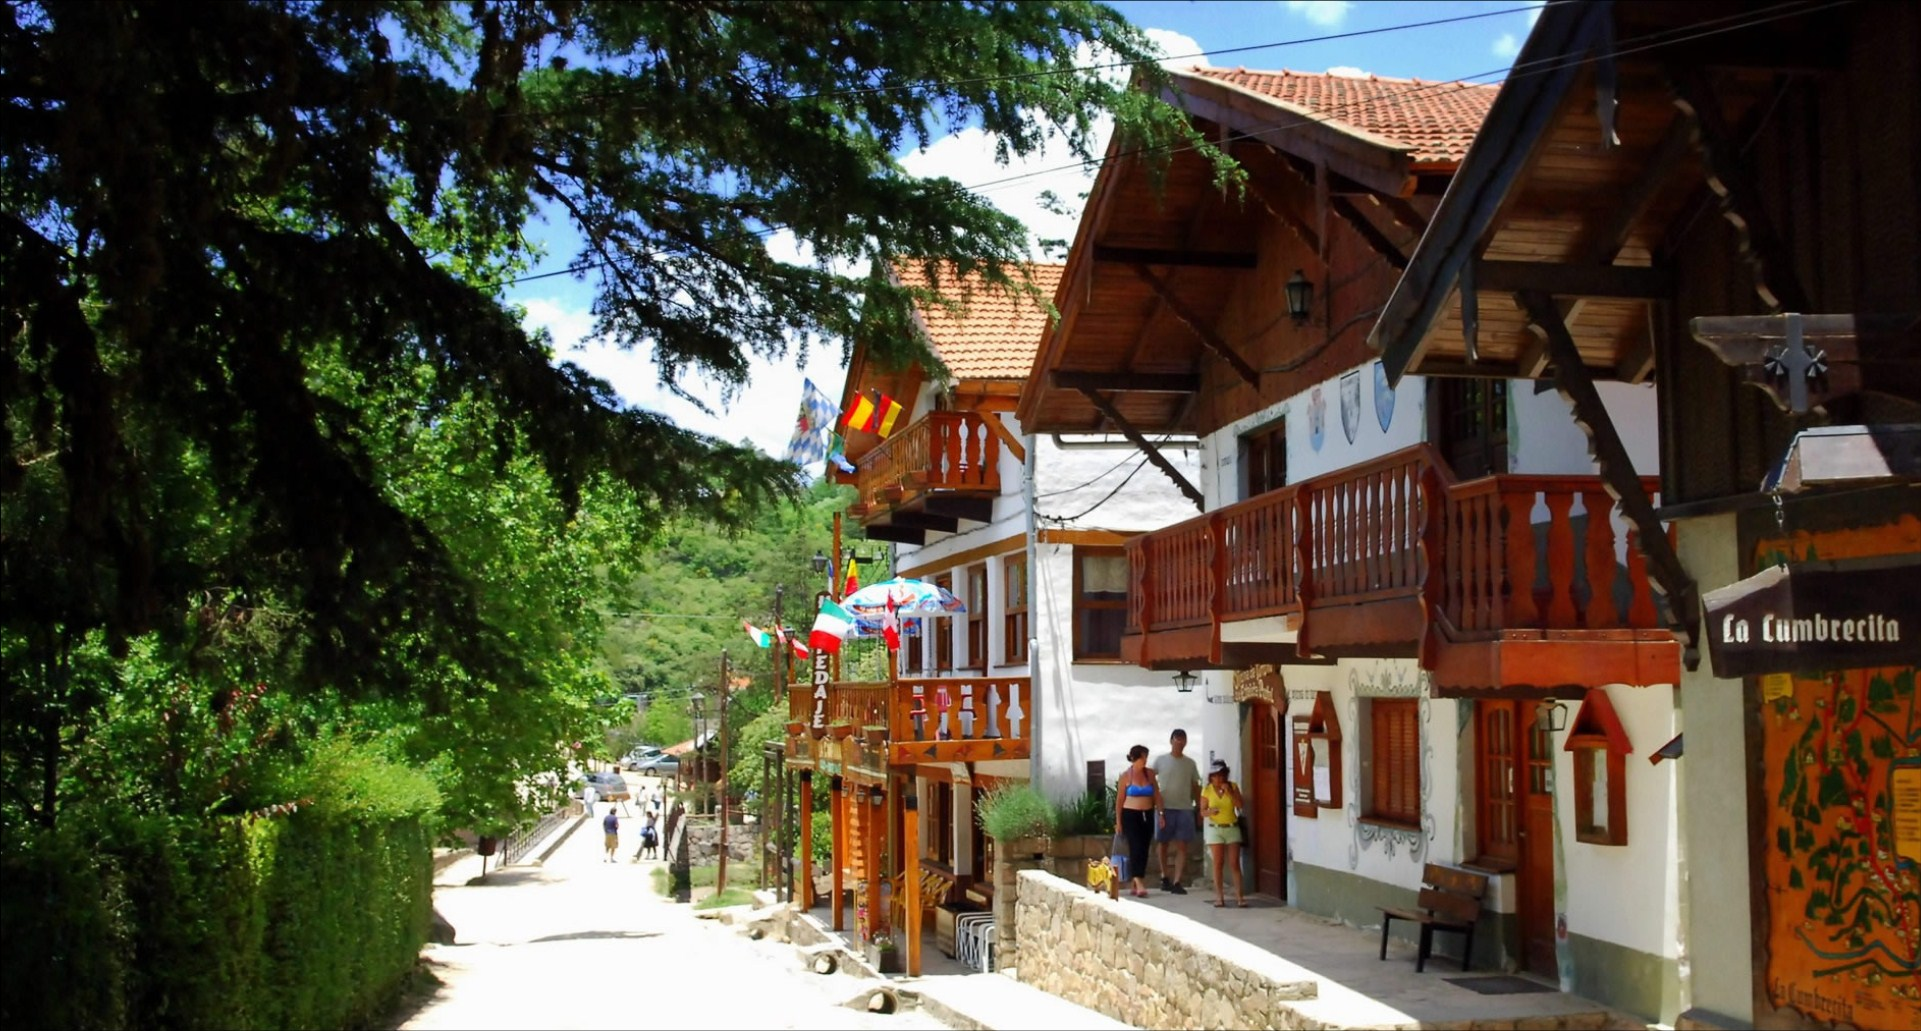 Valle-de-Calamuchita-7